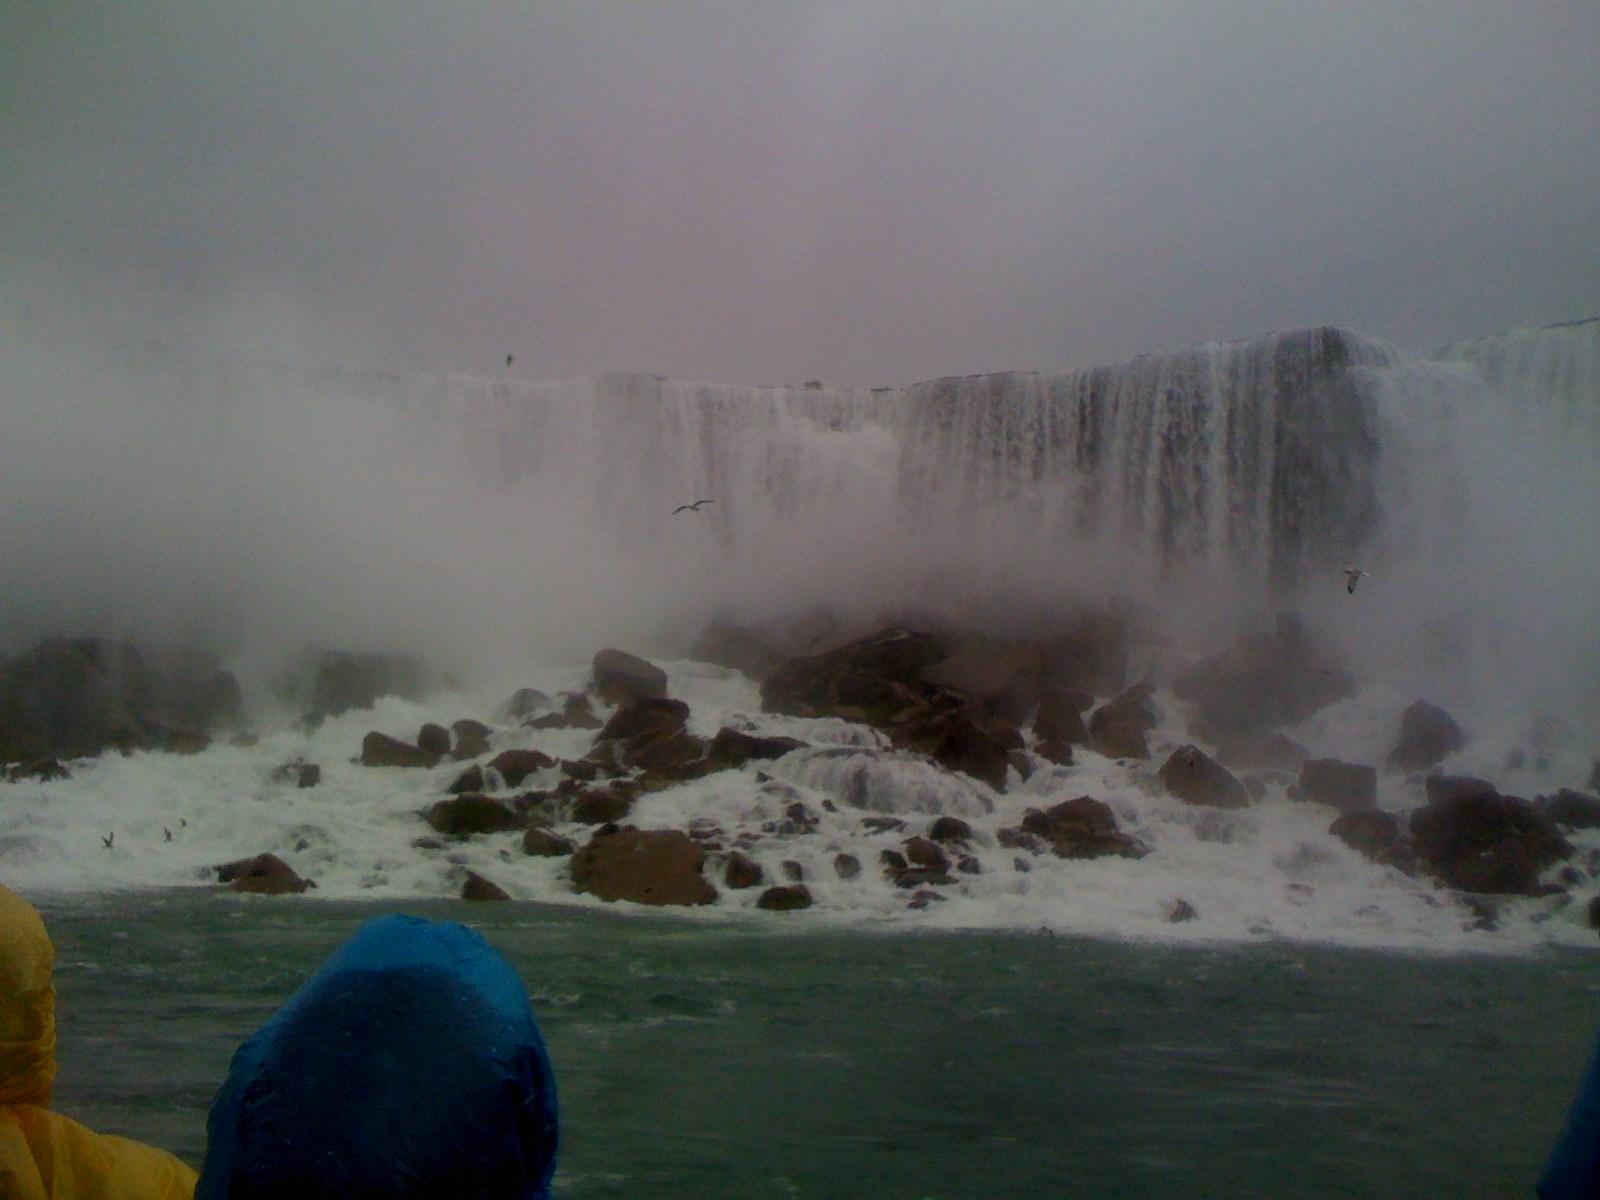 Bridal Veil Falls at Niagara Falls